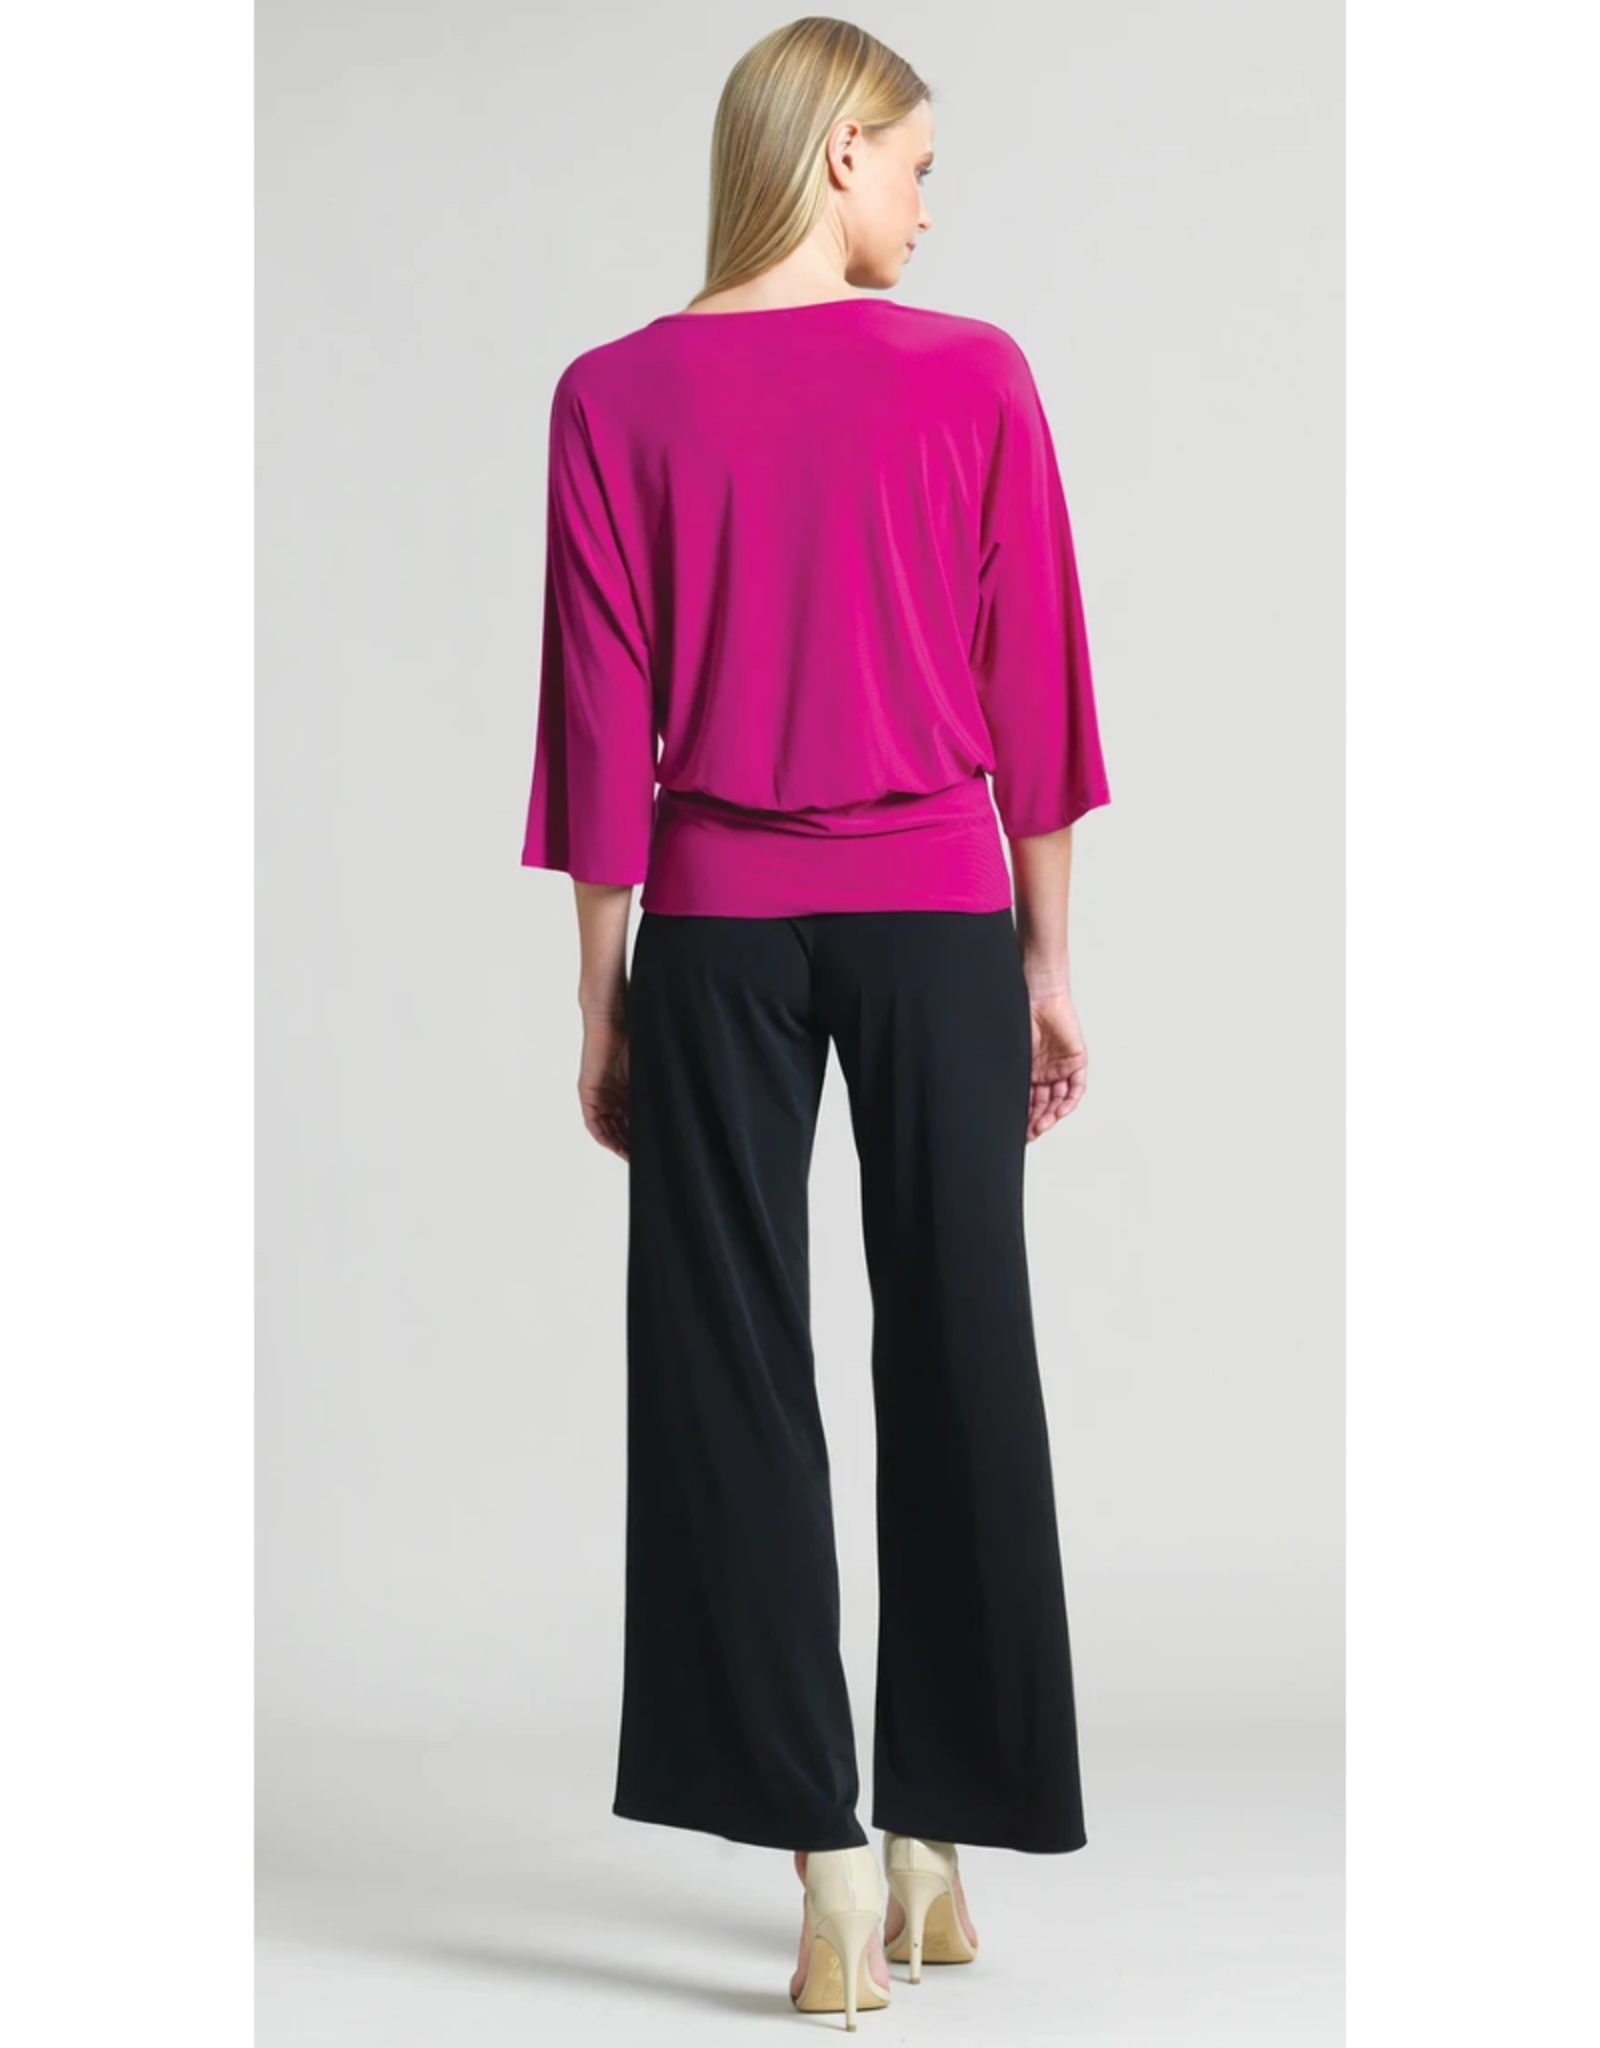 Side Tie Knit Top - 2 Colors